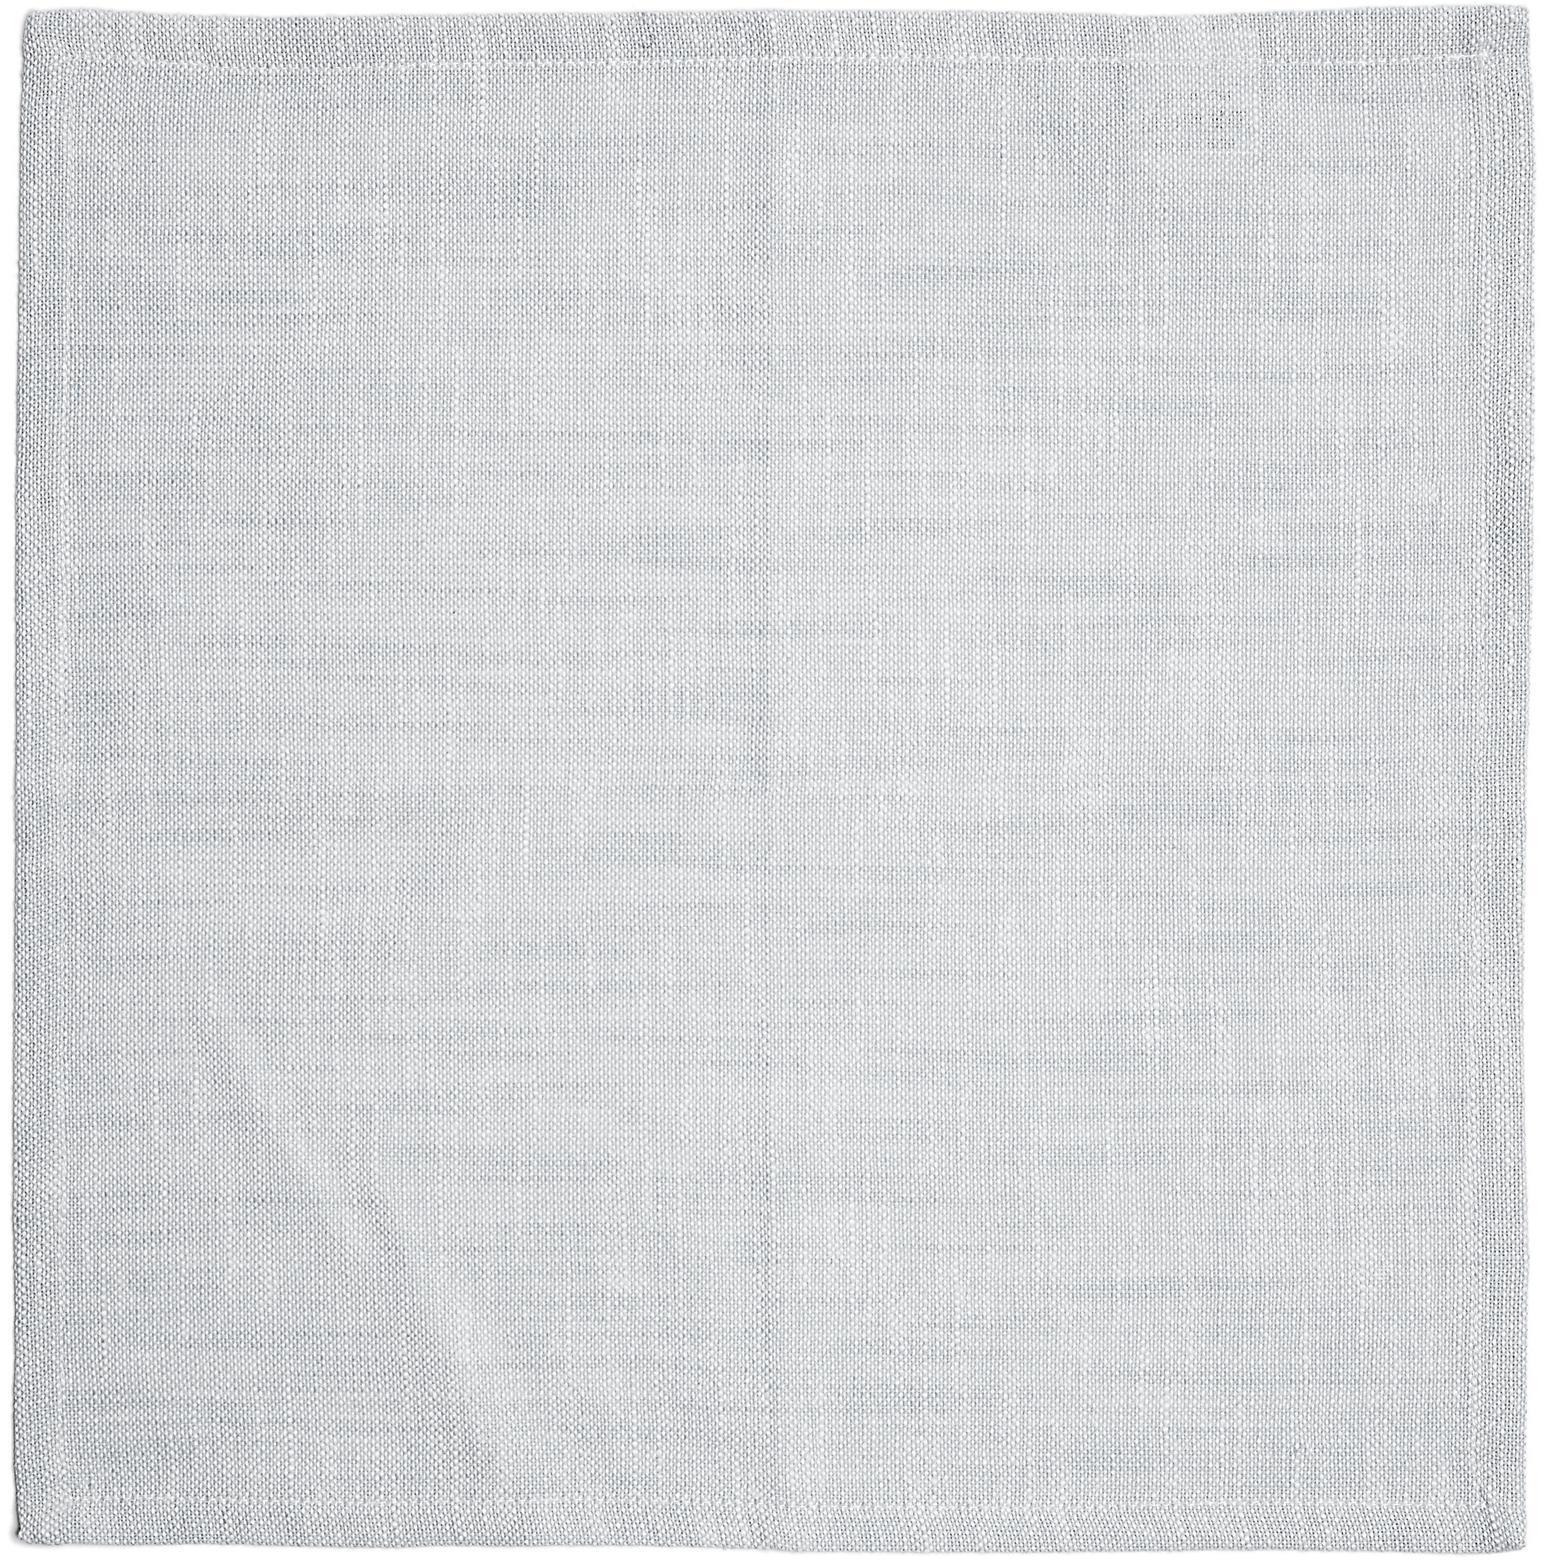 Baumwoll-Servietten Tonnika, 4 Stück, Baumwolle, Blaugrau, 45 x 45 cm